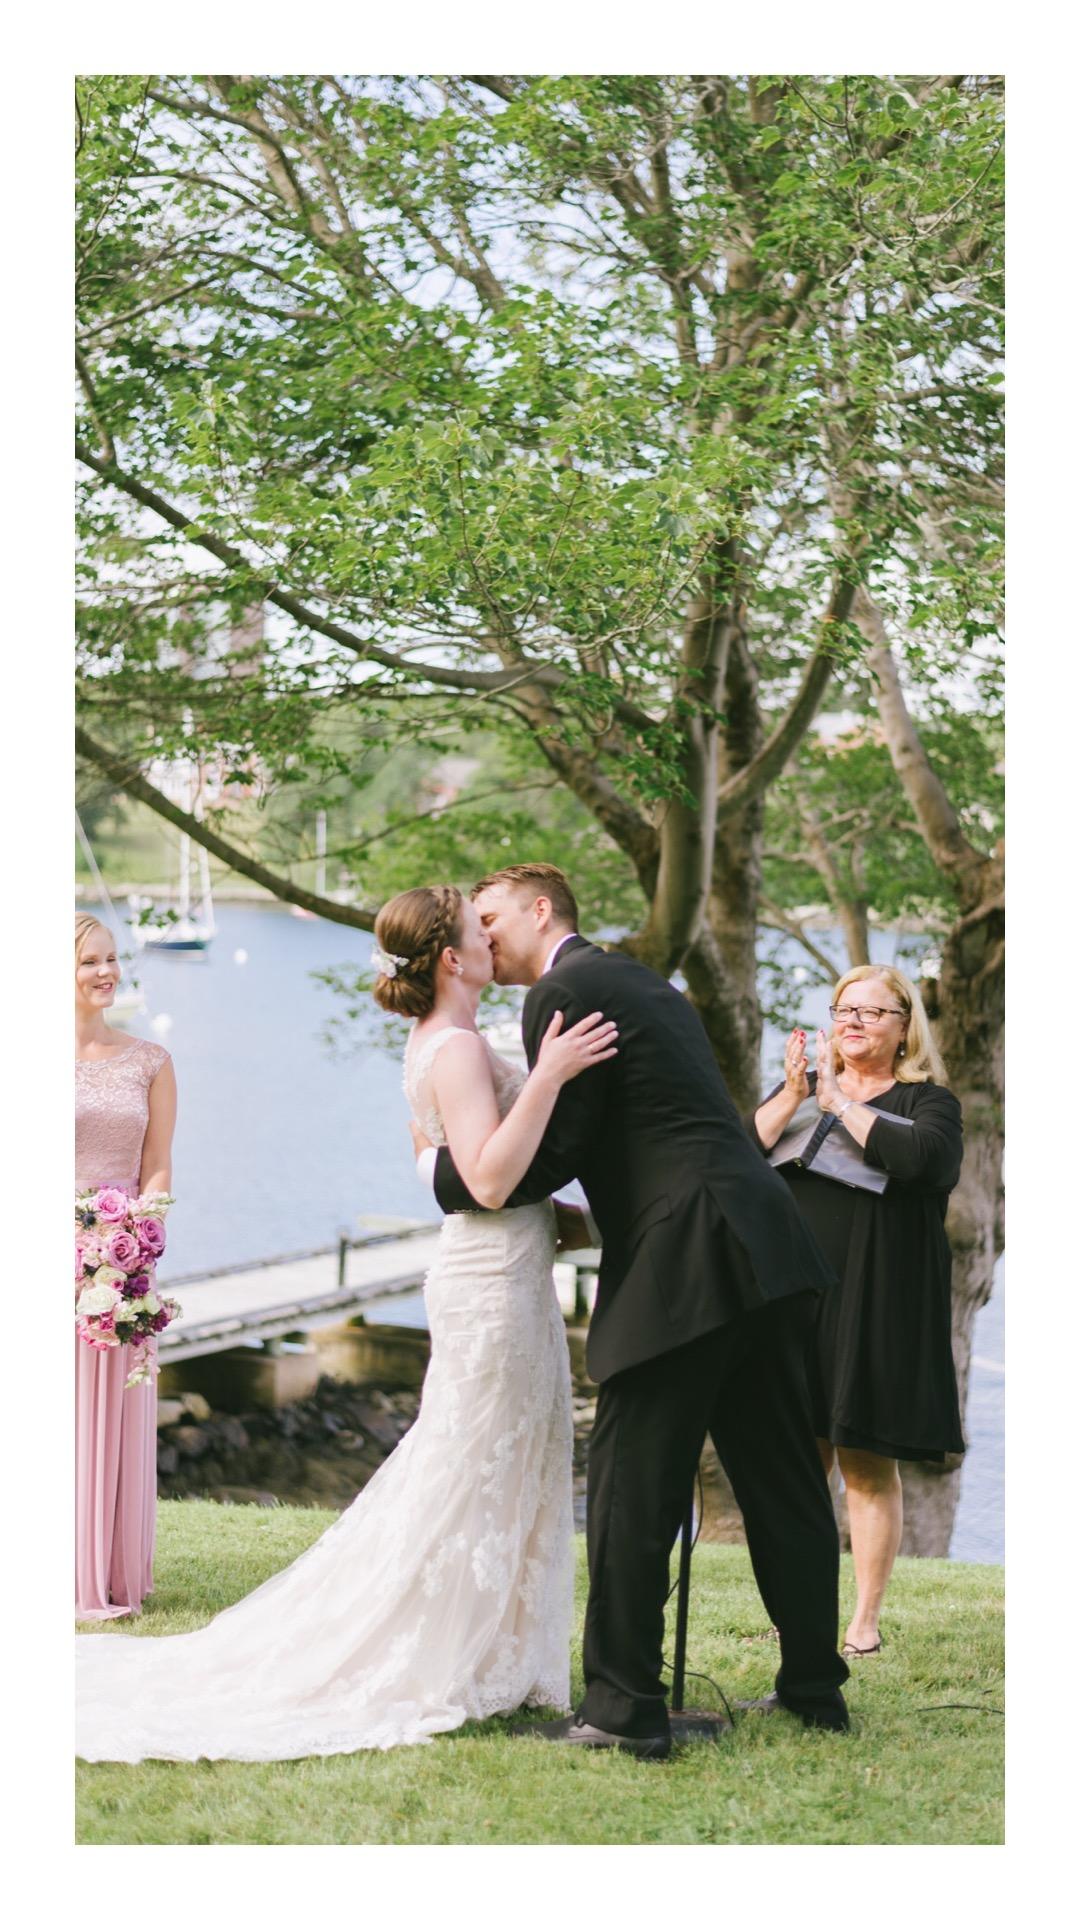 Martina & Scott Halifax Wedding Photographer - Sinead Dubeau Photography 14